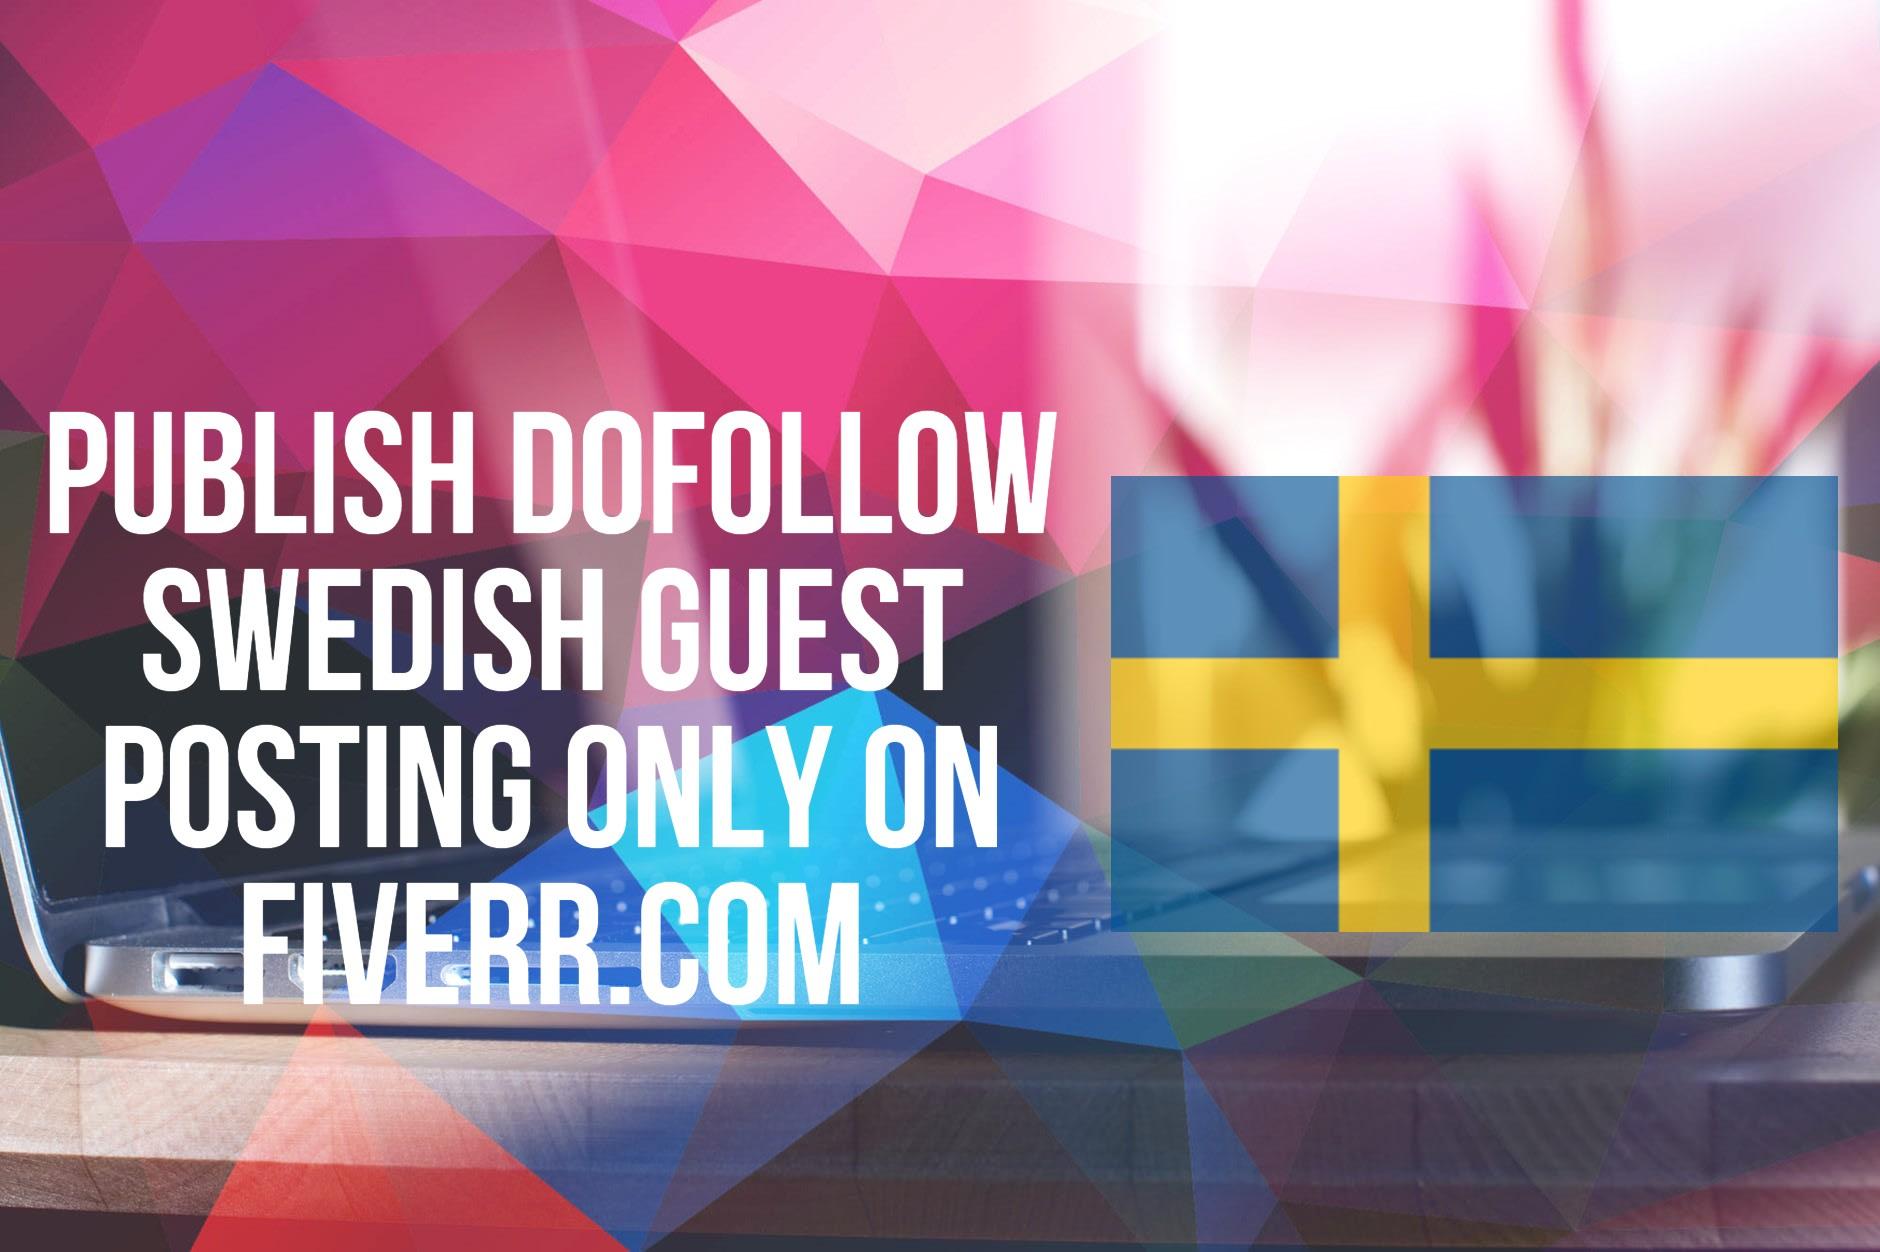 publish swedish guest posting with 114k traffic